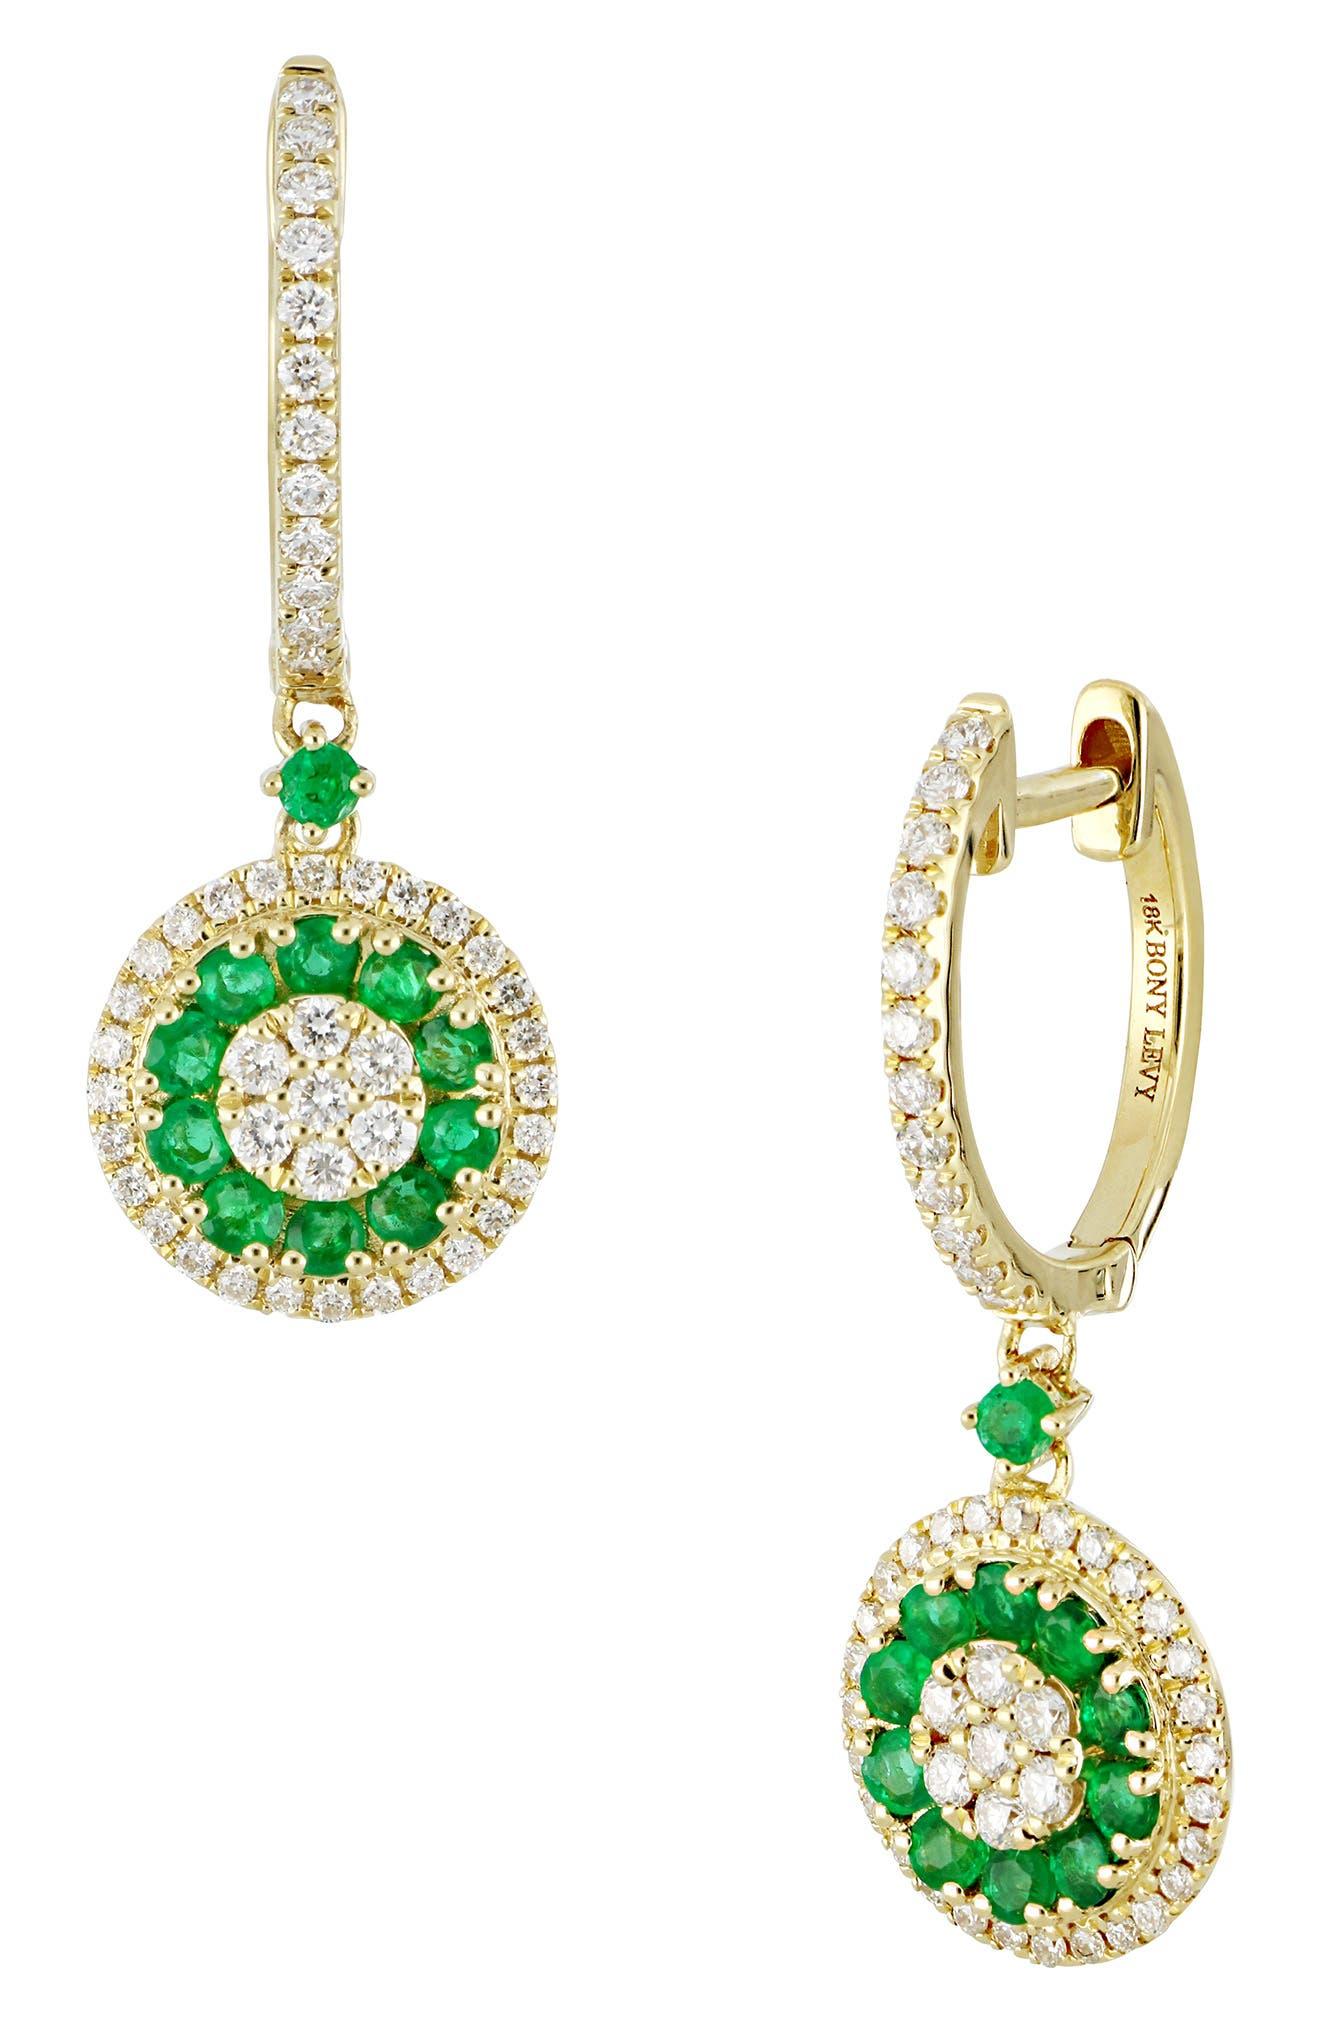 Diamond & Emerald Drop Earrings,                             Main thumbnail 1, color,                             GOLD/ EMERALD